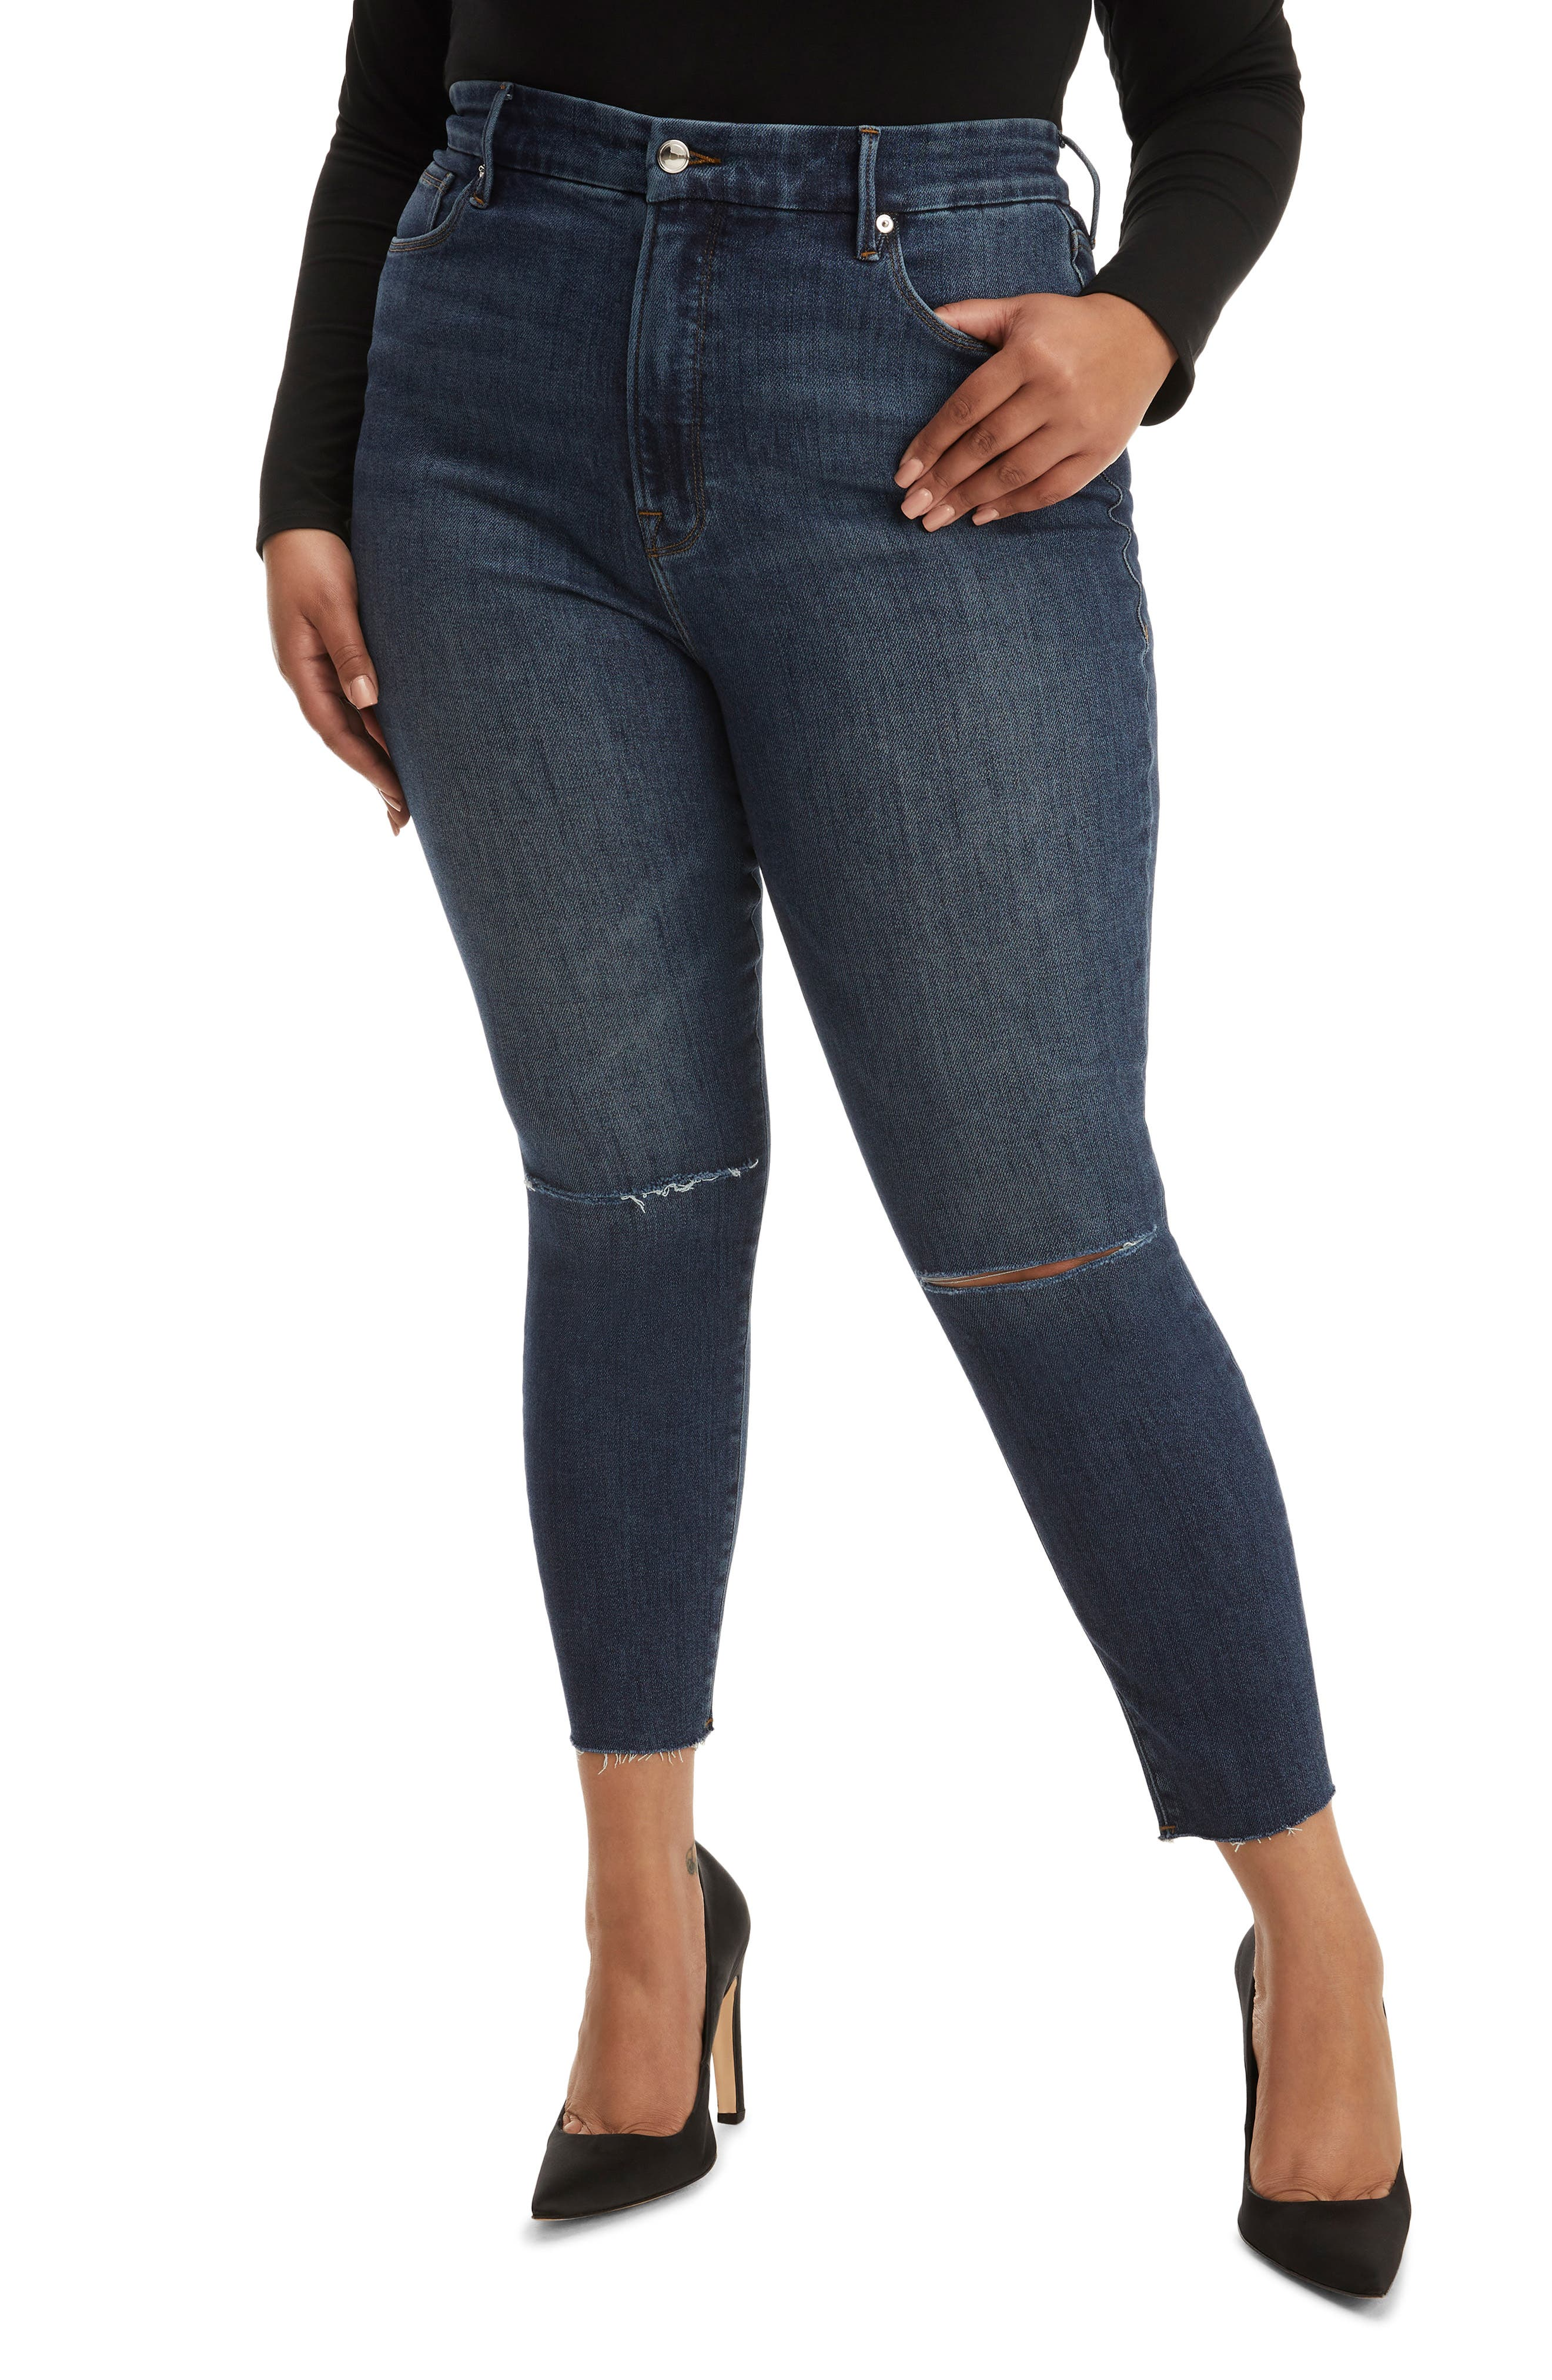 Women's Good American Good Waist High Waist Ripped Raw Edge Crop Skinny Jeans